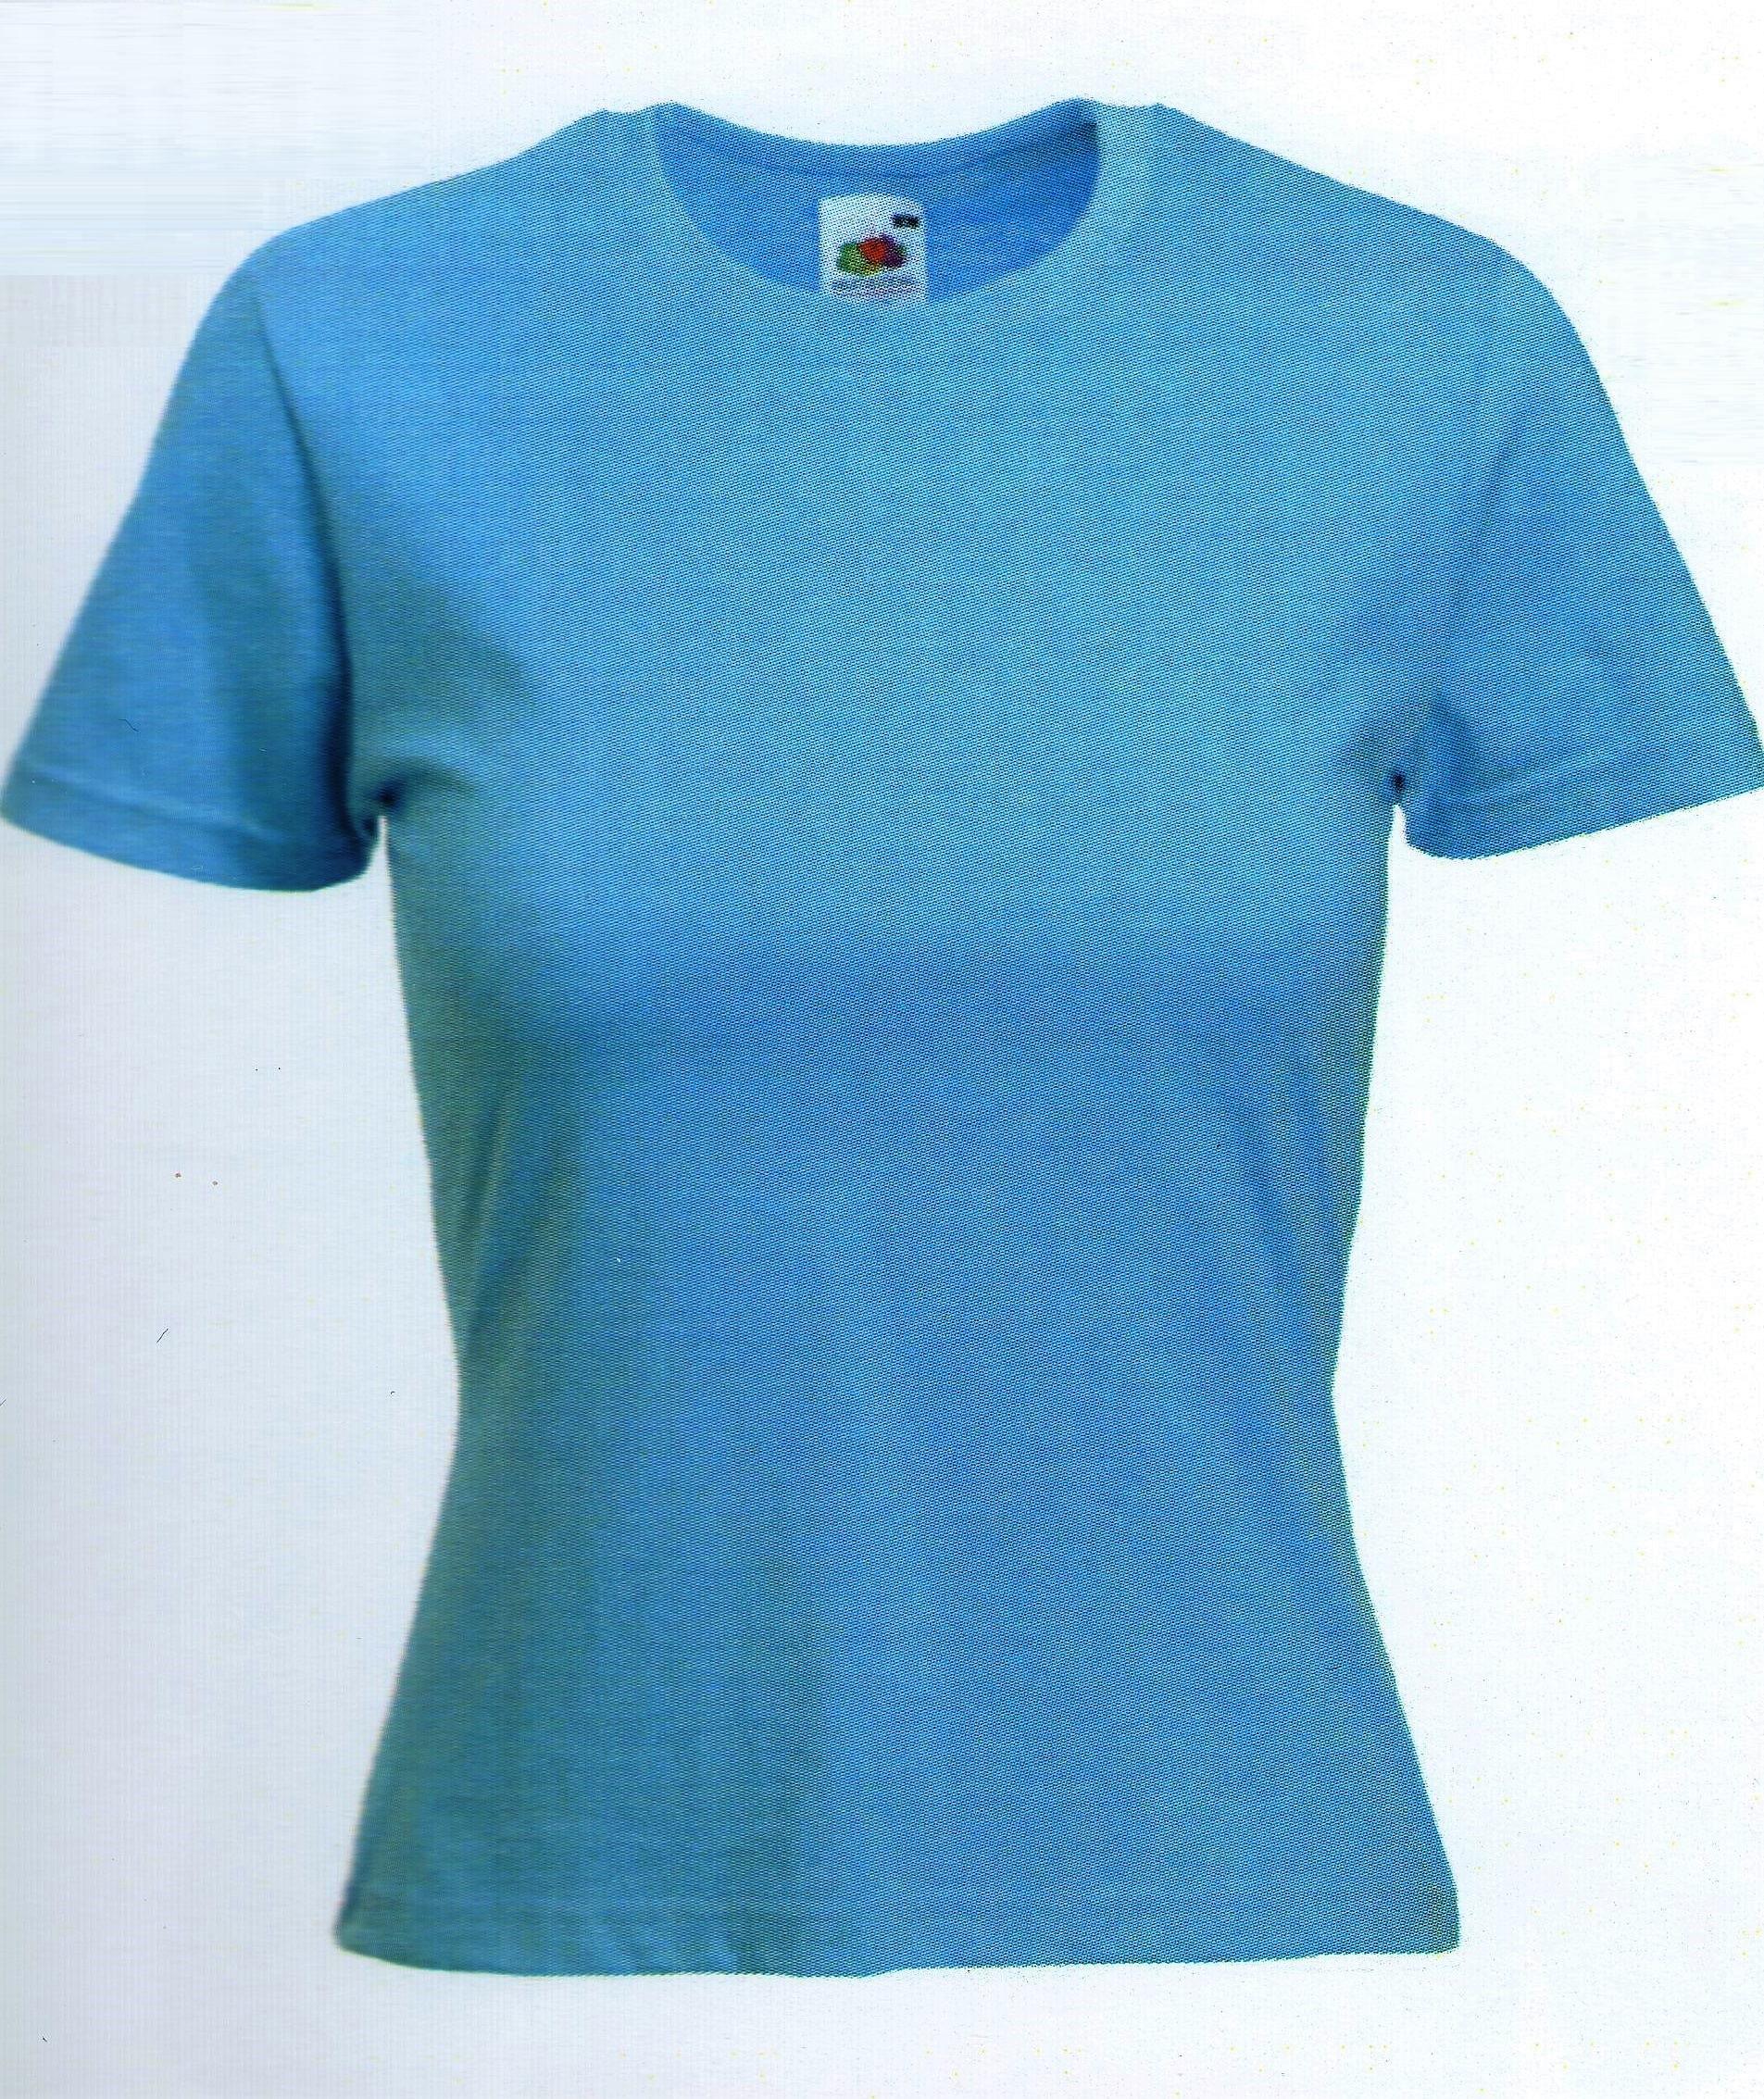 T-Shirt από 100% Βαμβάκι